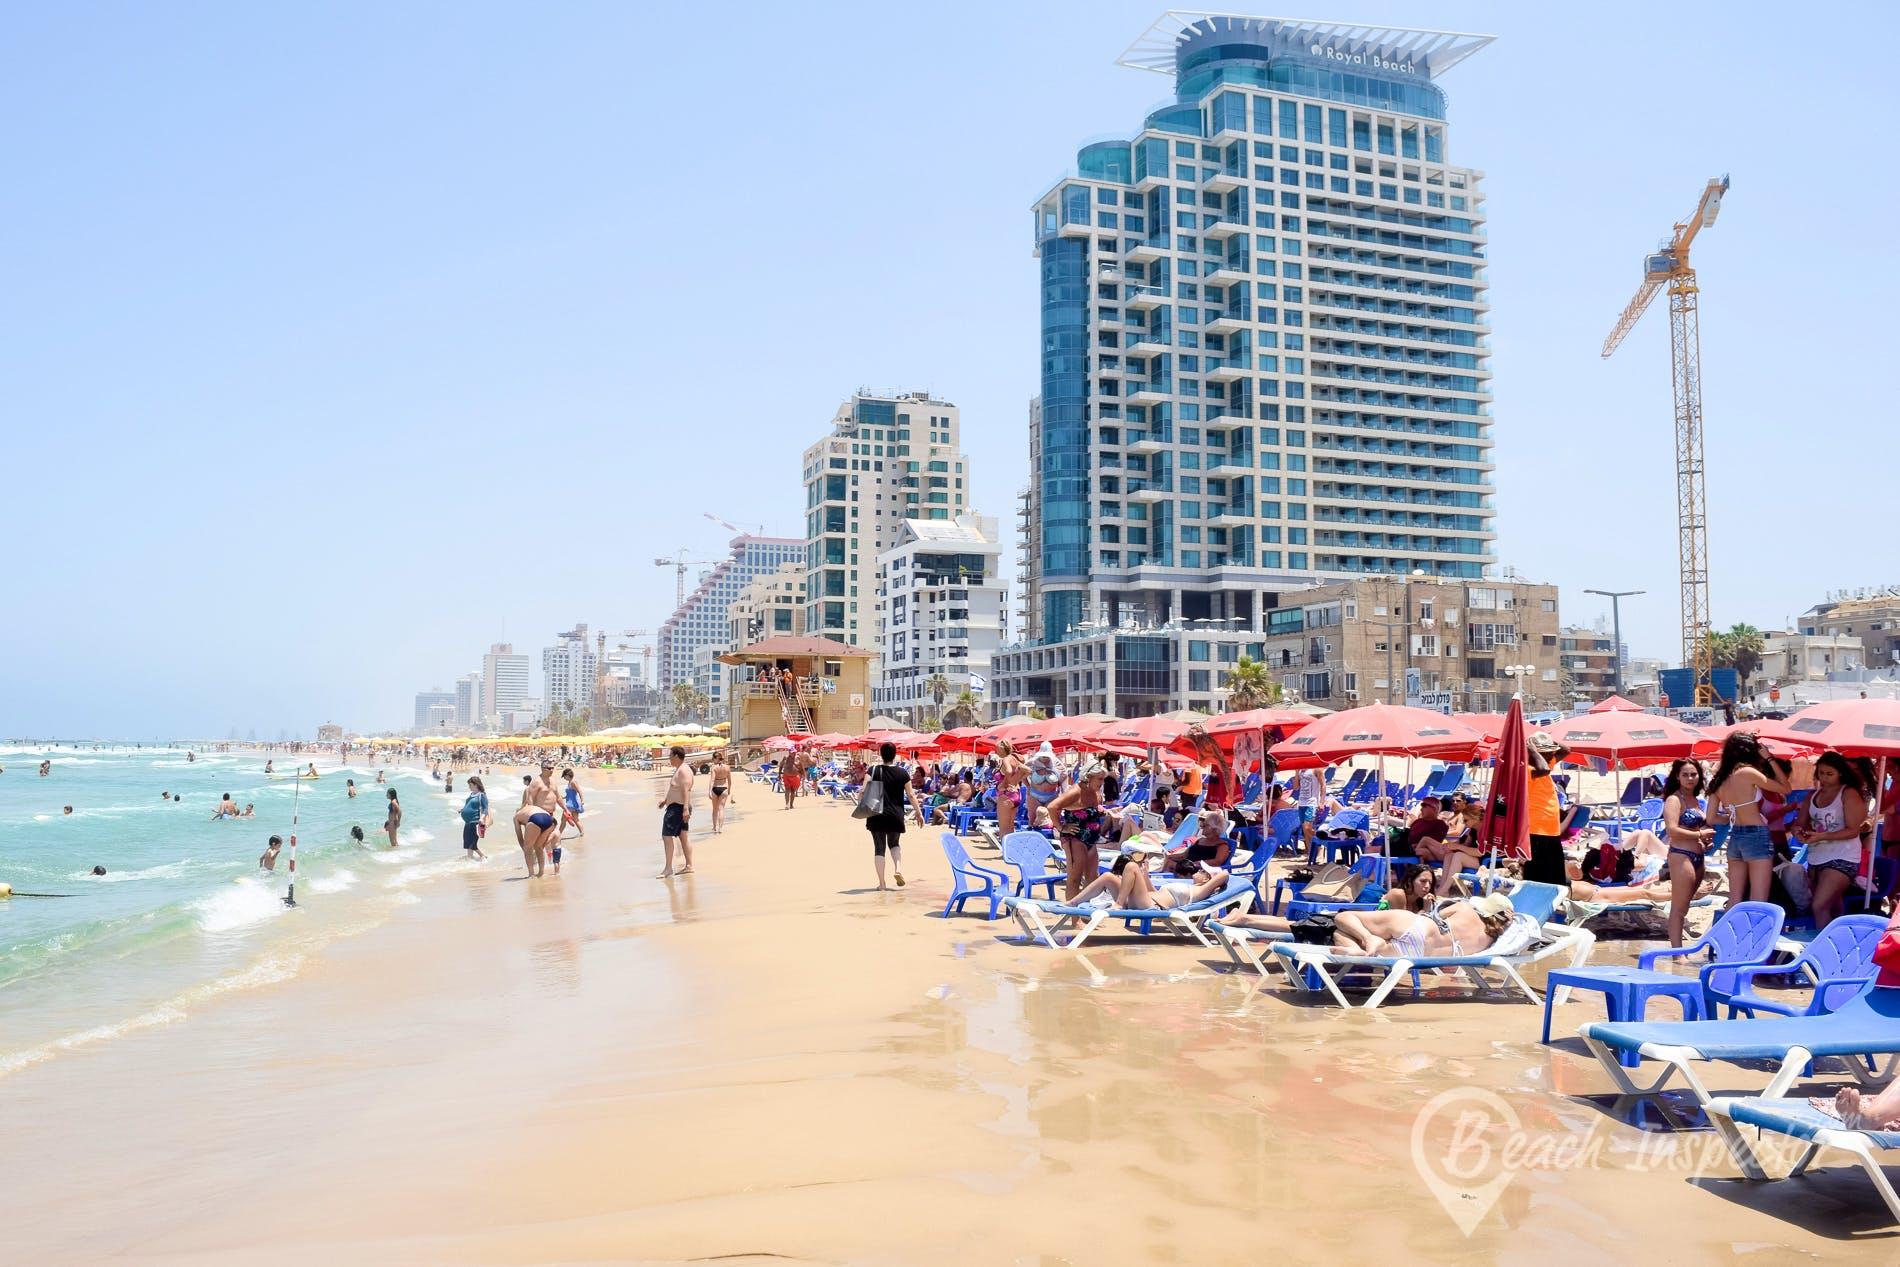 Playa Dolphinarium Beach, Israel, Israel